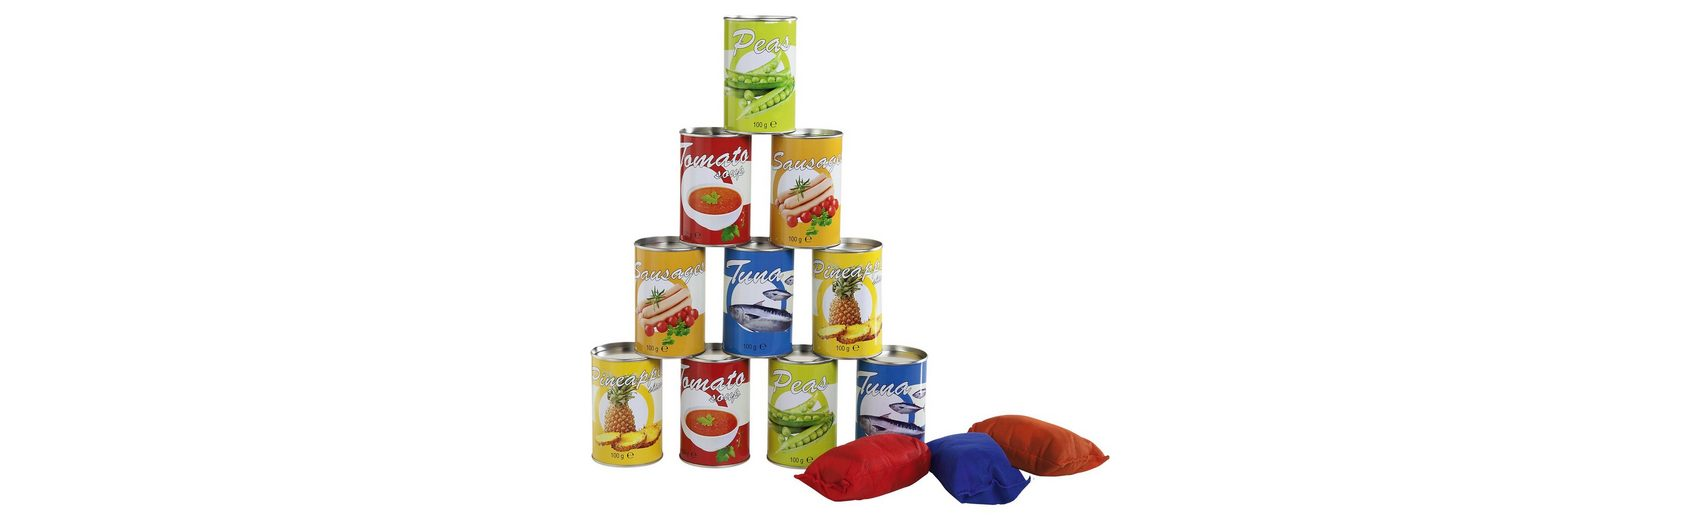 Buiten Speel (BS) Tin Throwing (food theme)